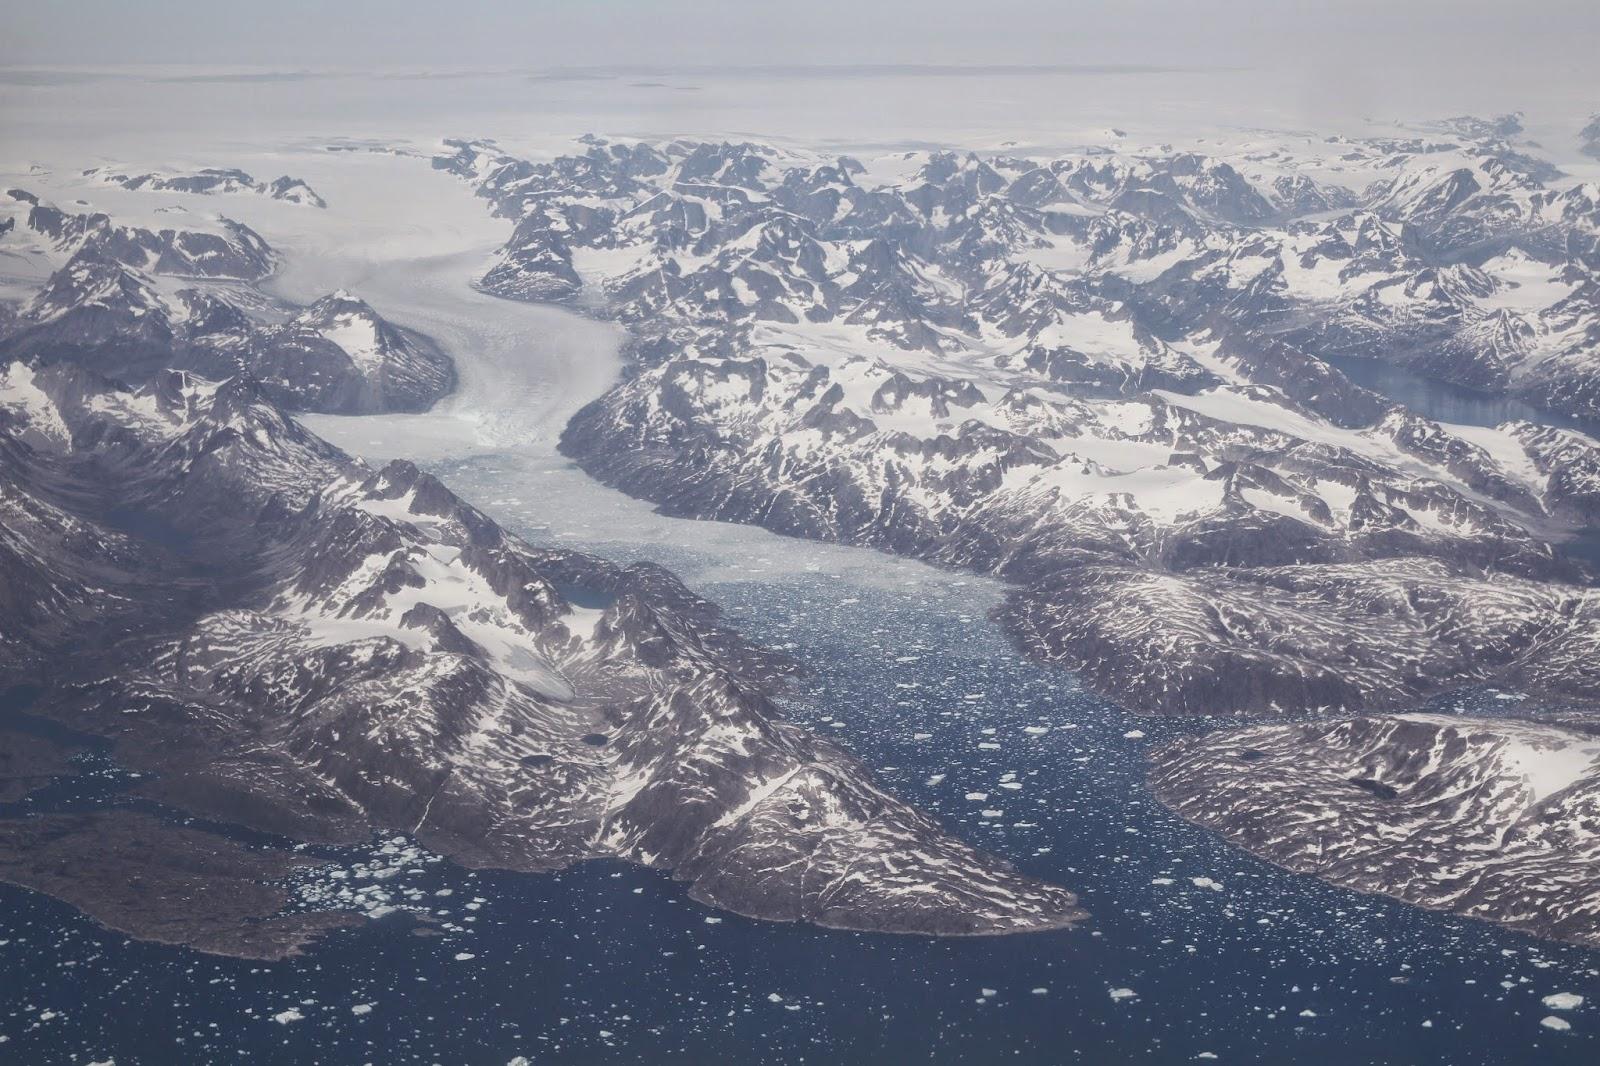 Visitar NARSARSUAQ, a porta de entrada no sul da Gronelândia